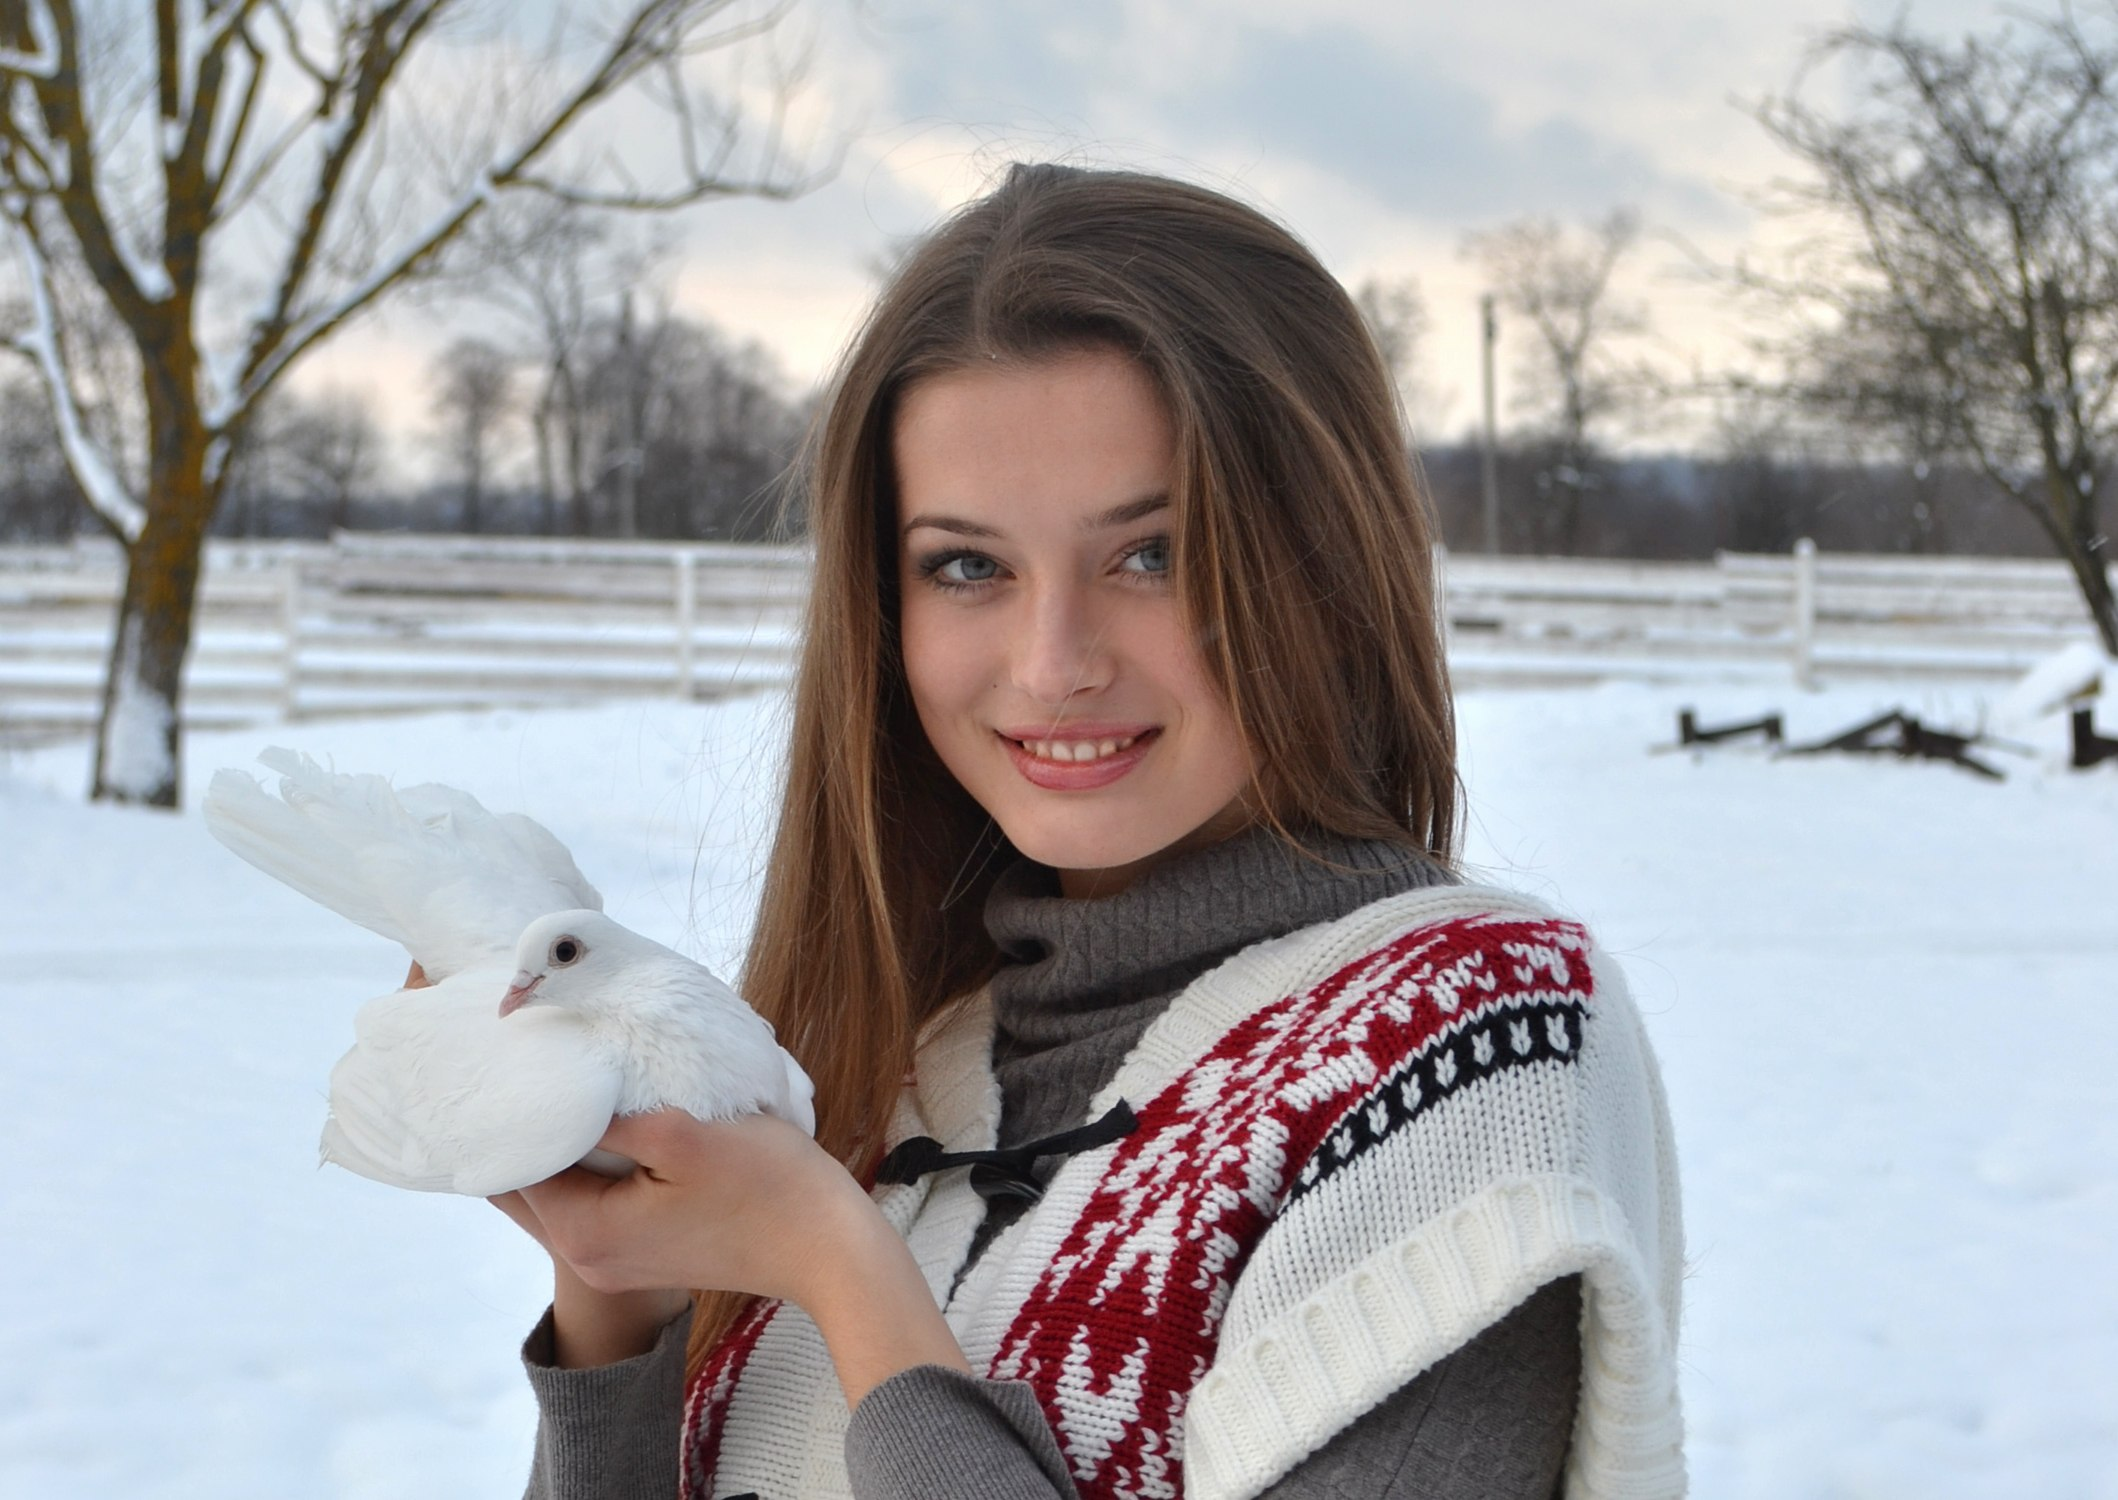 Фото красивой девушки дворник